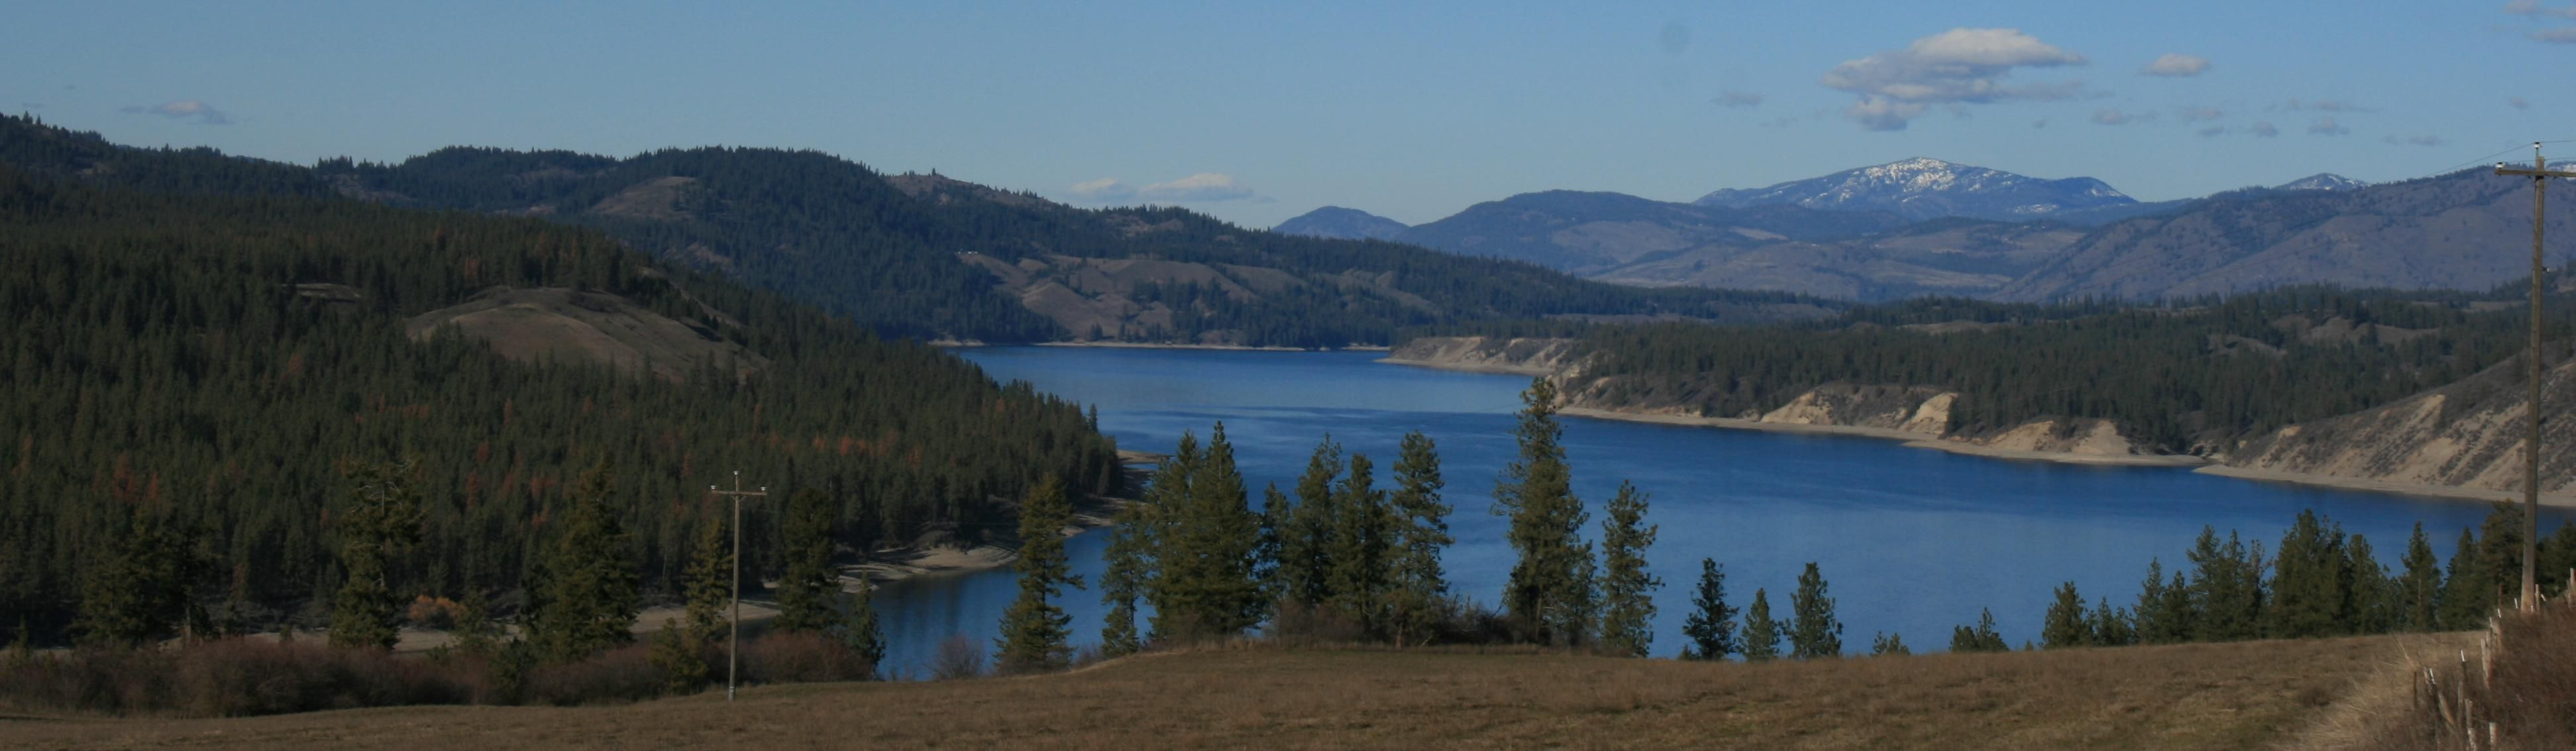 Lake Roosevelt National Recreation Area U S National